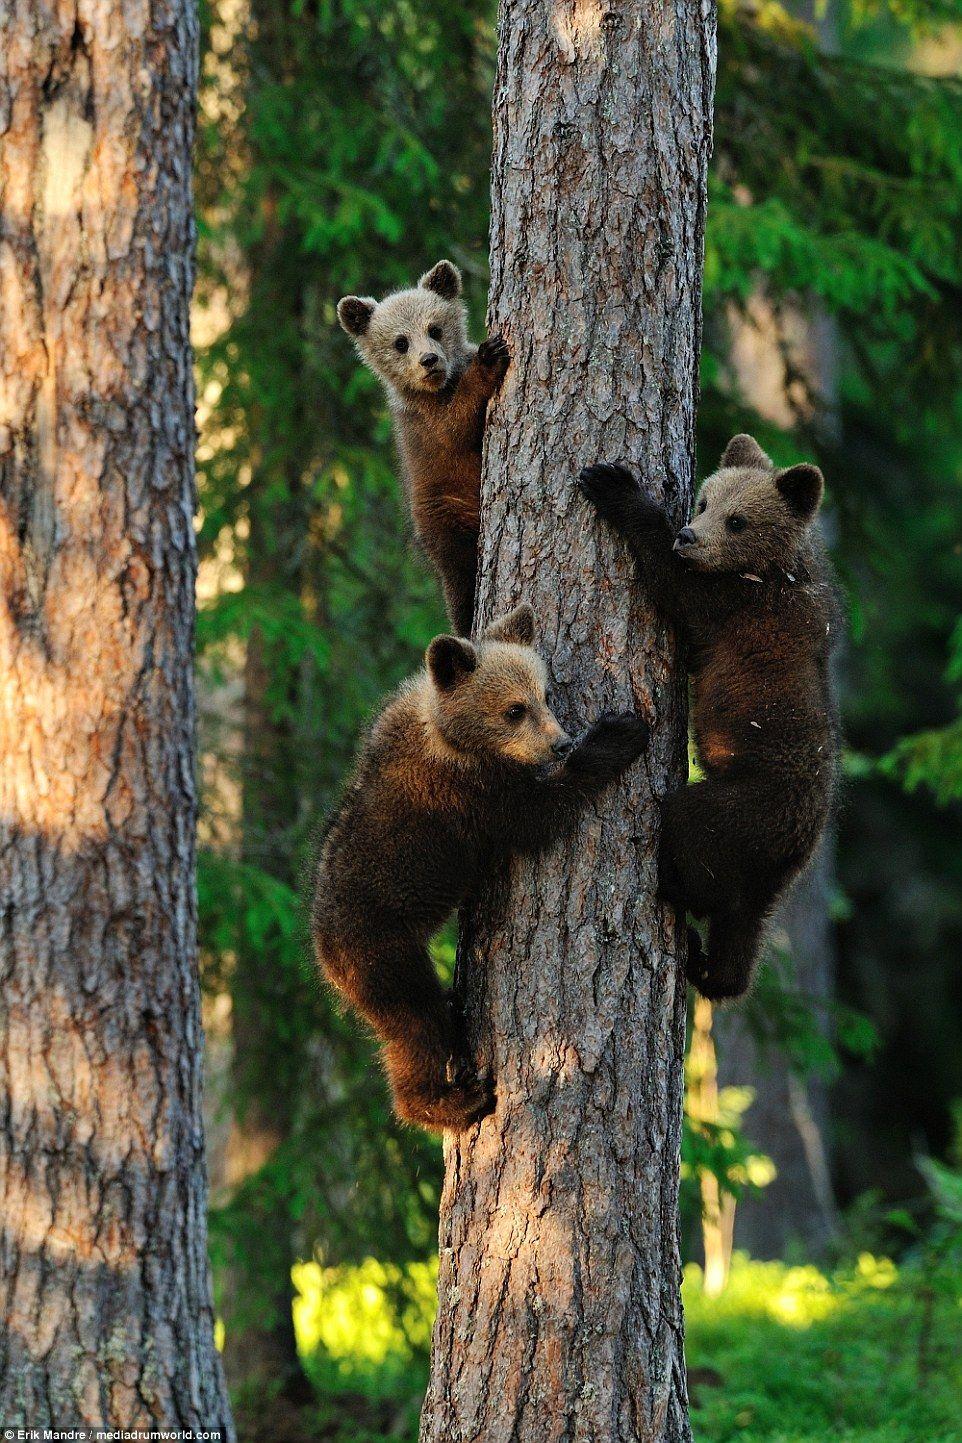 The cute brown bears can be seen scrambling around the trees in North Karelia, Finland, te...